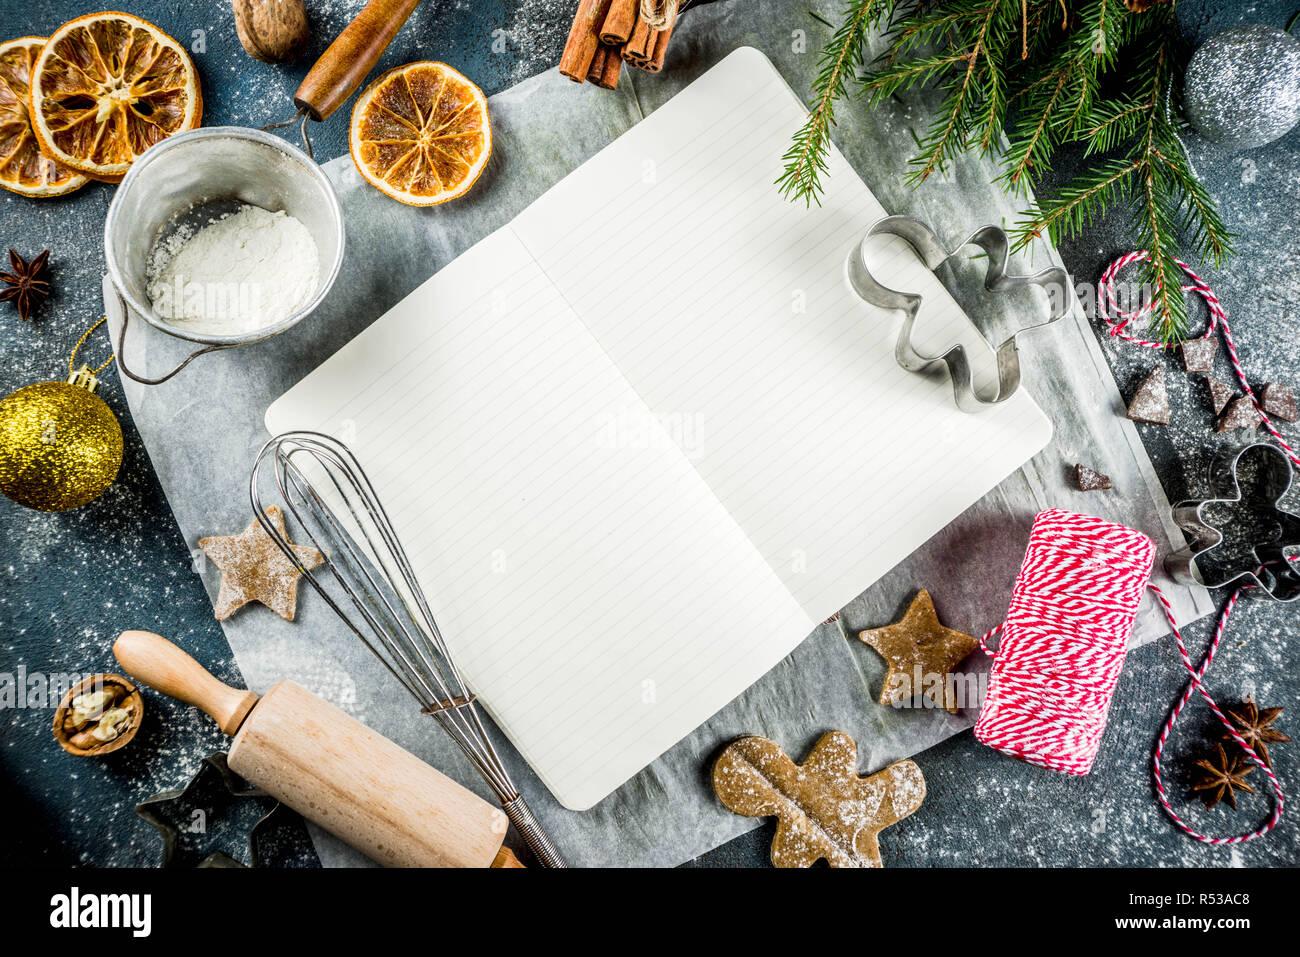 Empty Cookbook For Christmas Recipes On Dark Blue Concrete